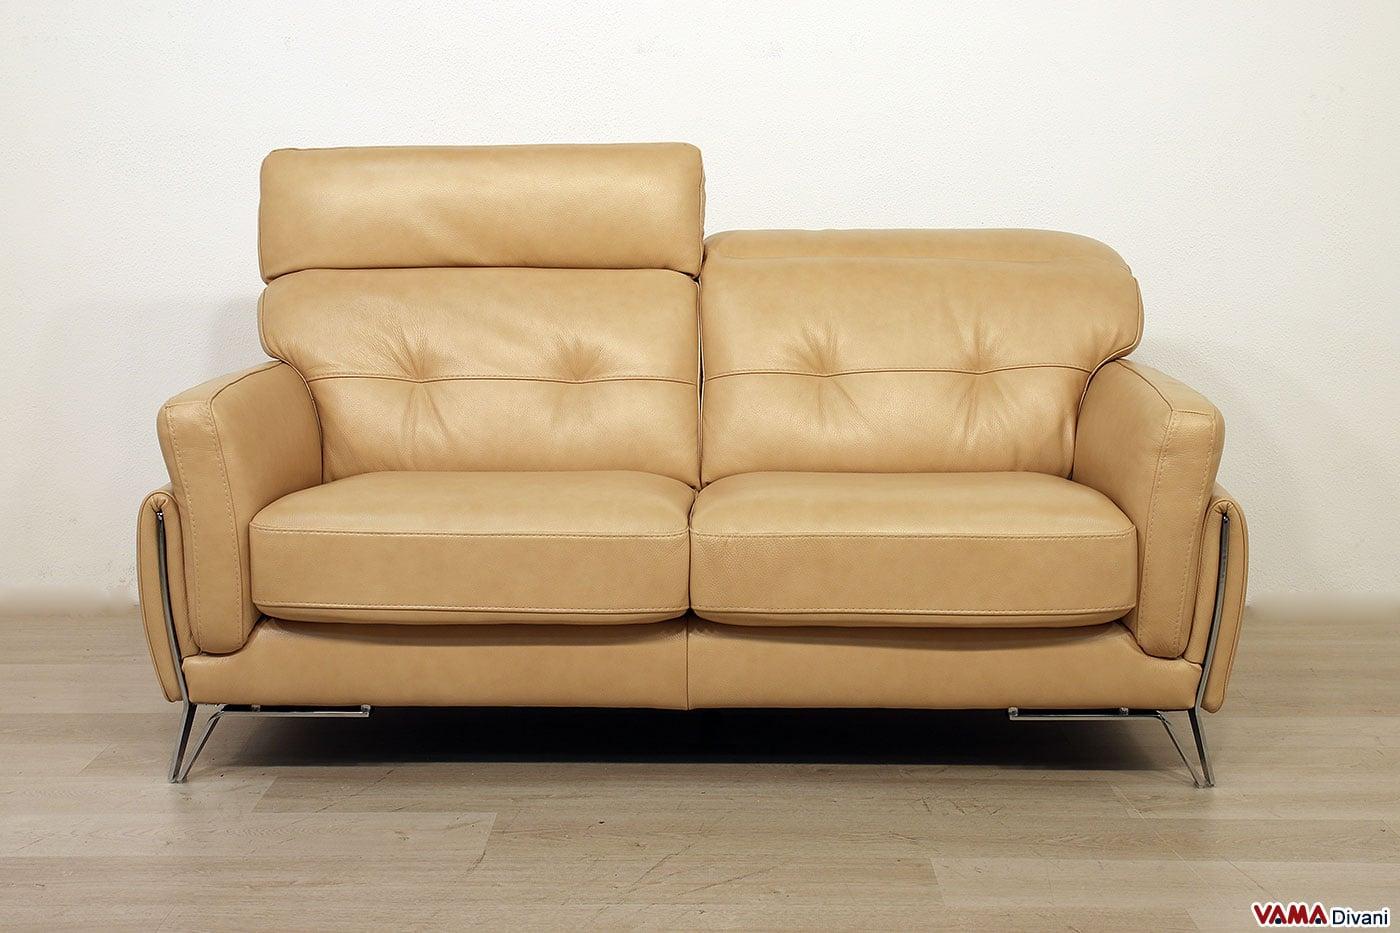 Offerta divano 2 posti ster vama divani - Divano 2 posti prezzo ...